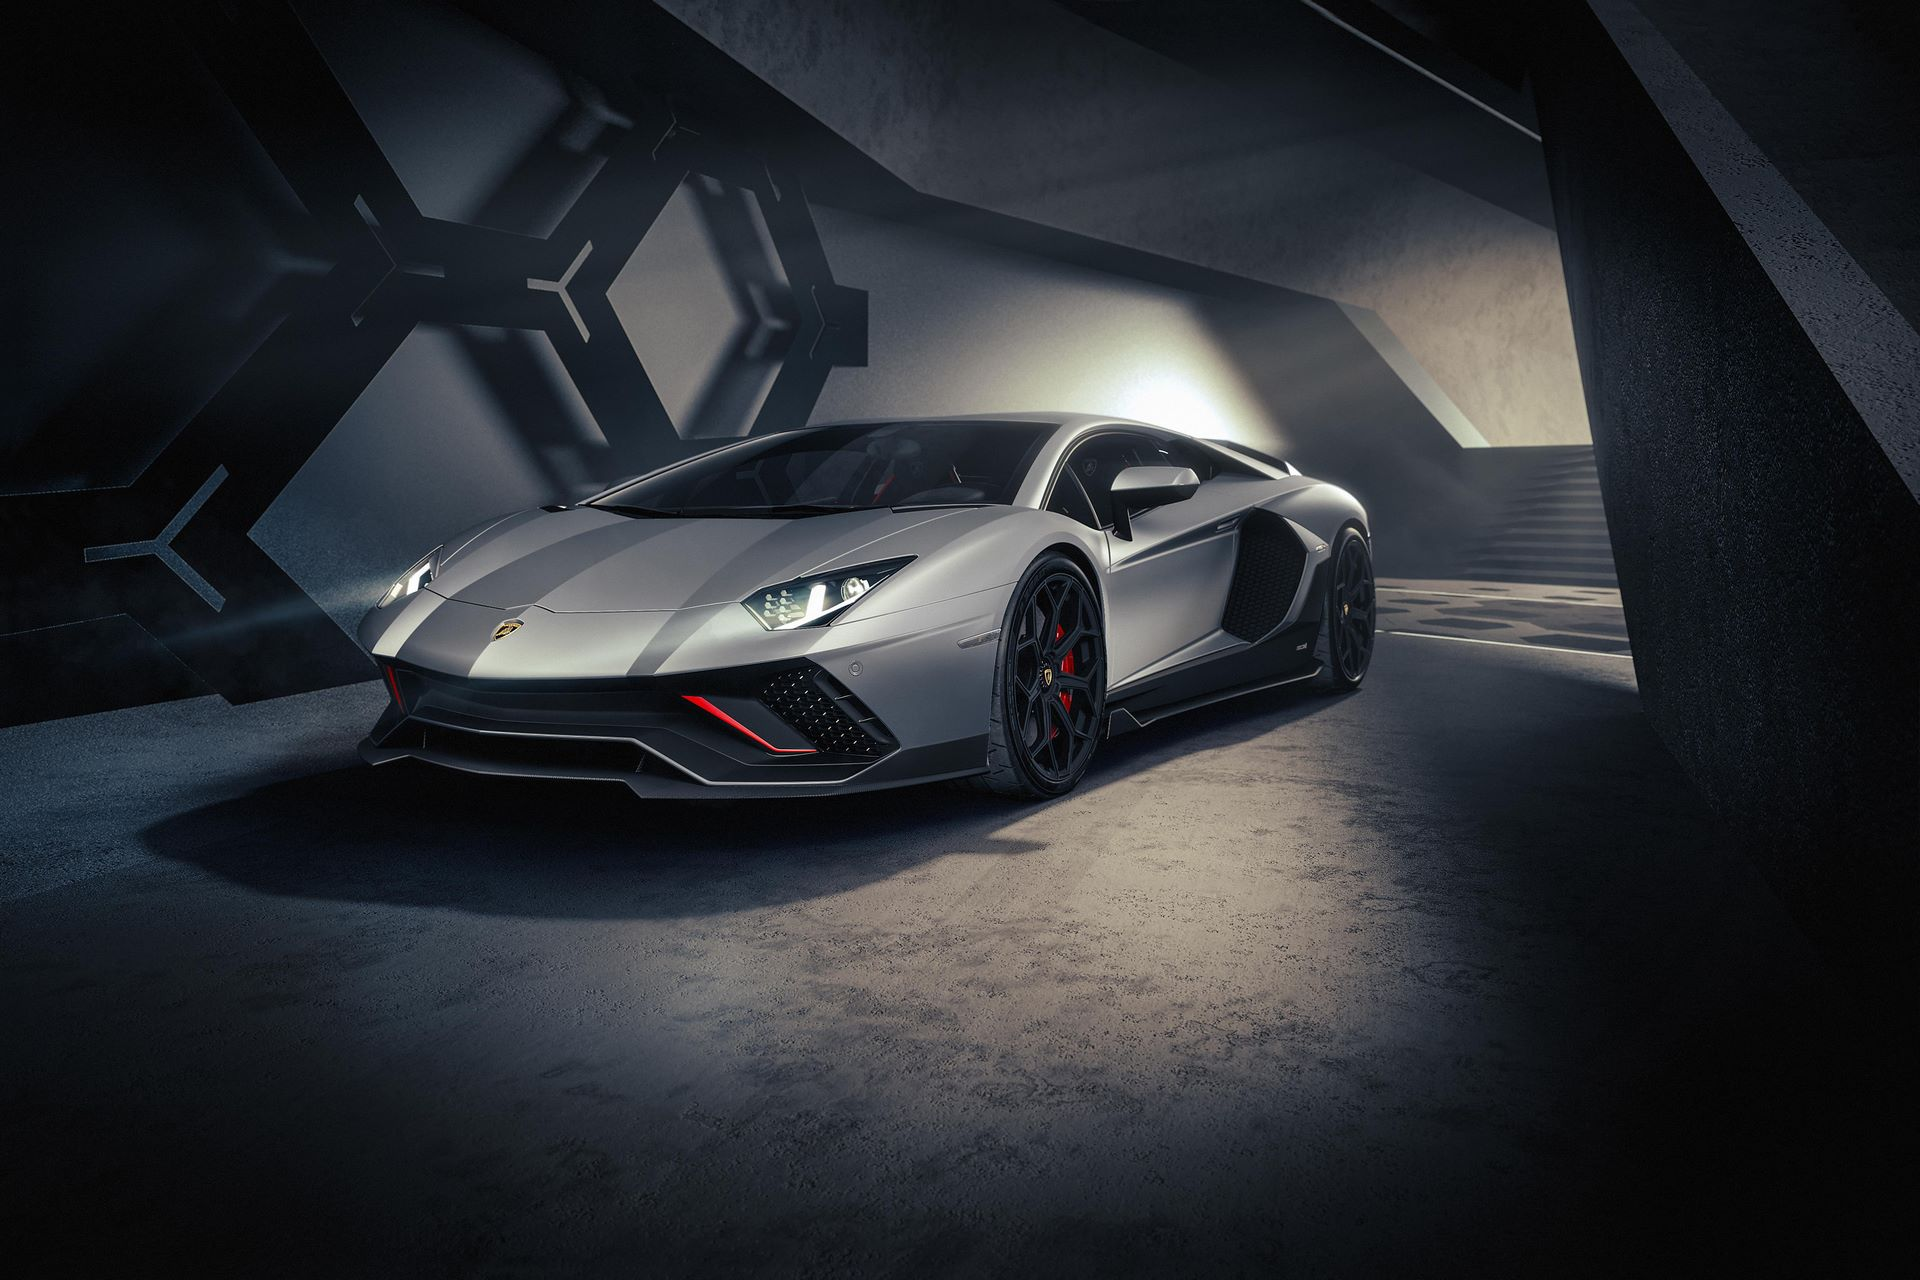 Lamborghini-Aventador-LP780-4-Ultimae-48